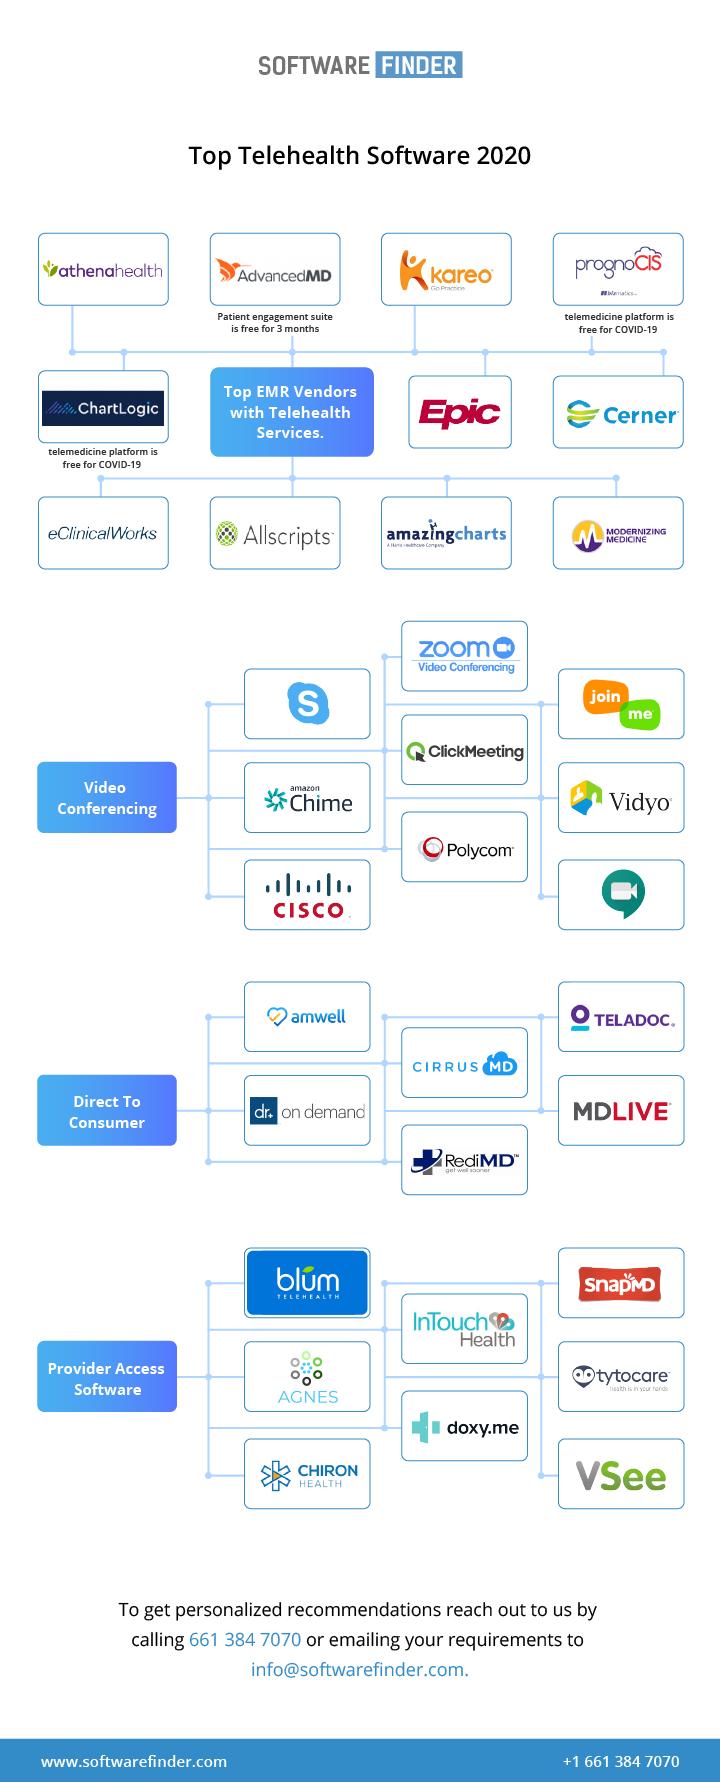 Top Telehealth software 2020